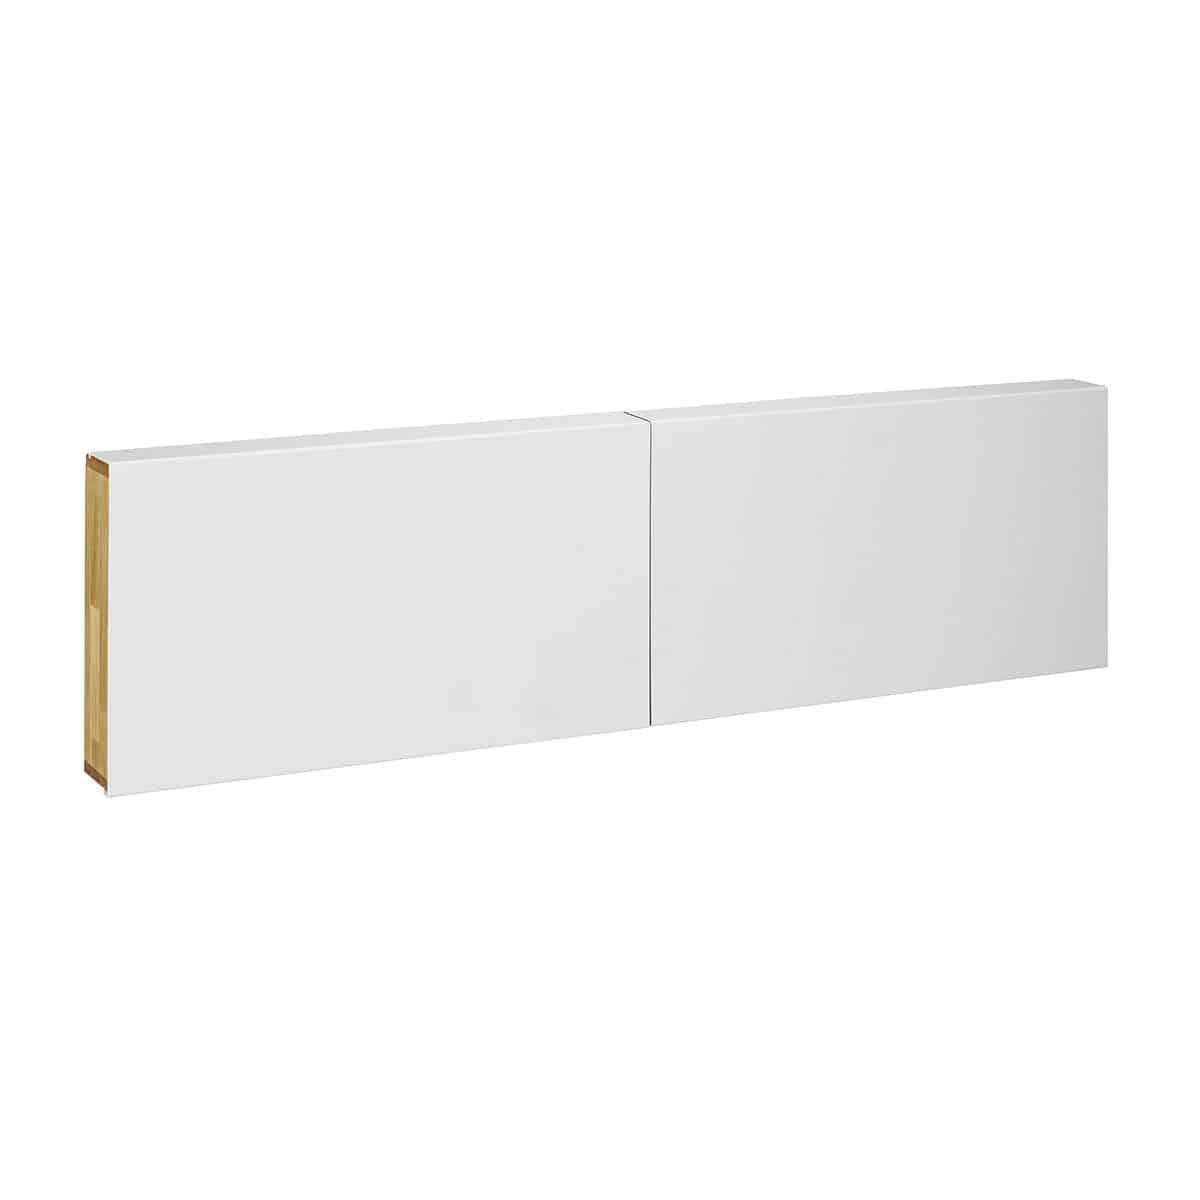 LAX Series King Headboard Cabinet by MASHstudios